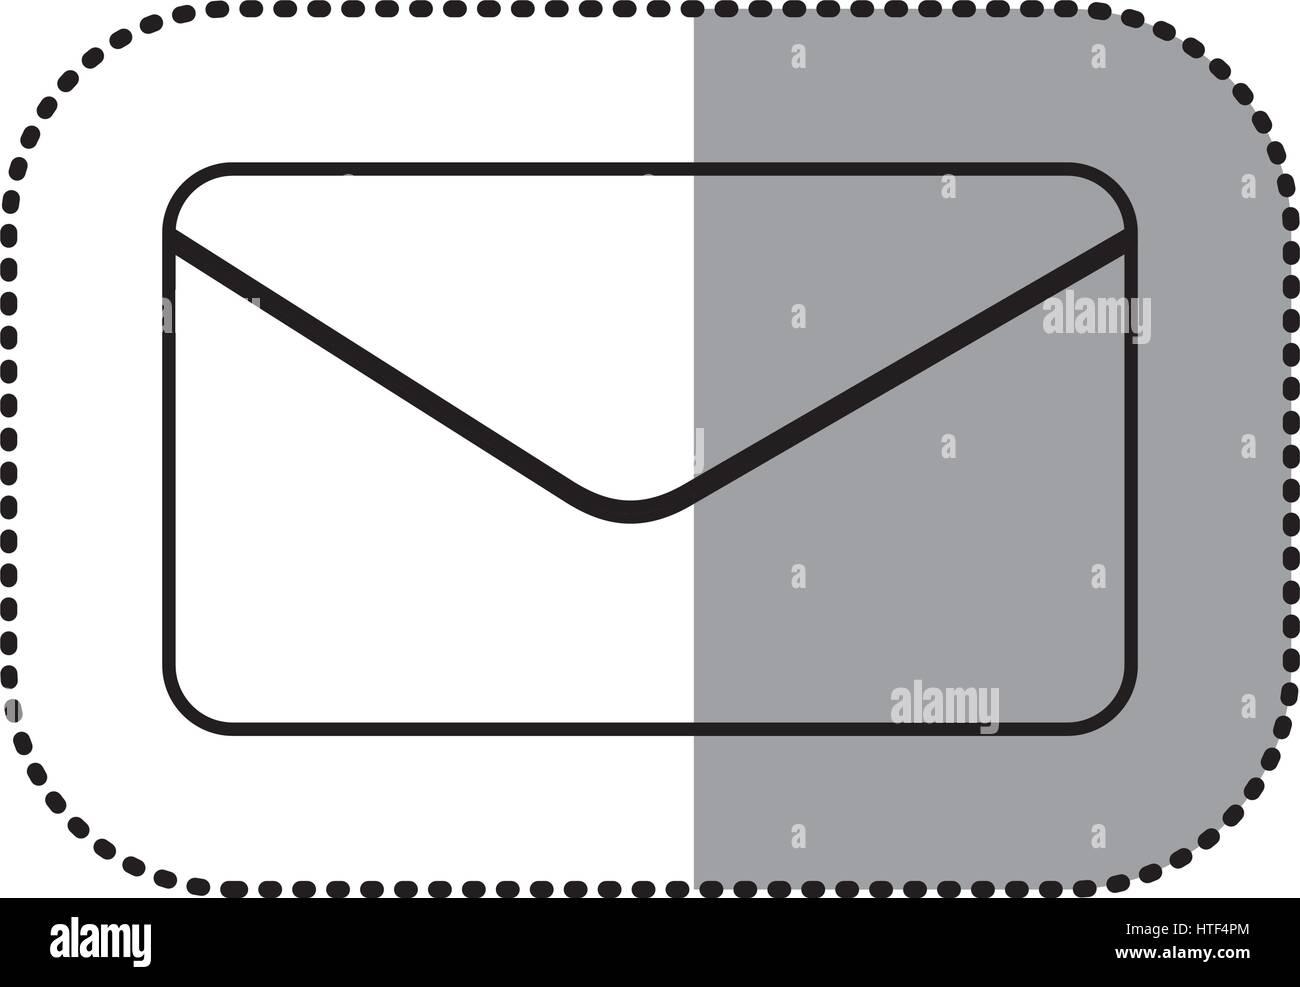 figure e-mail message icon - Stock Image